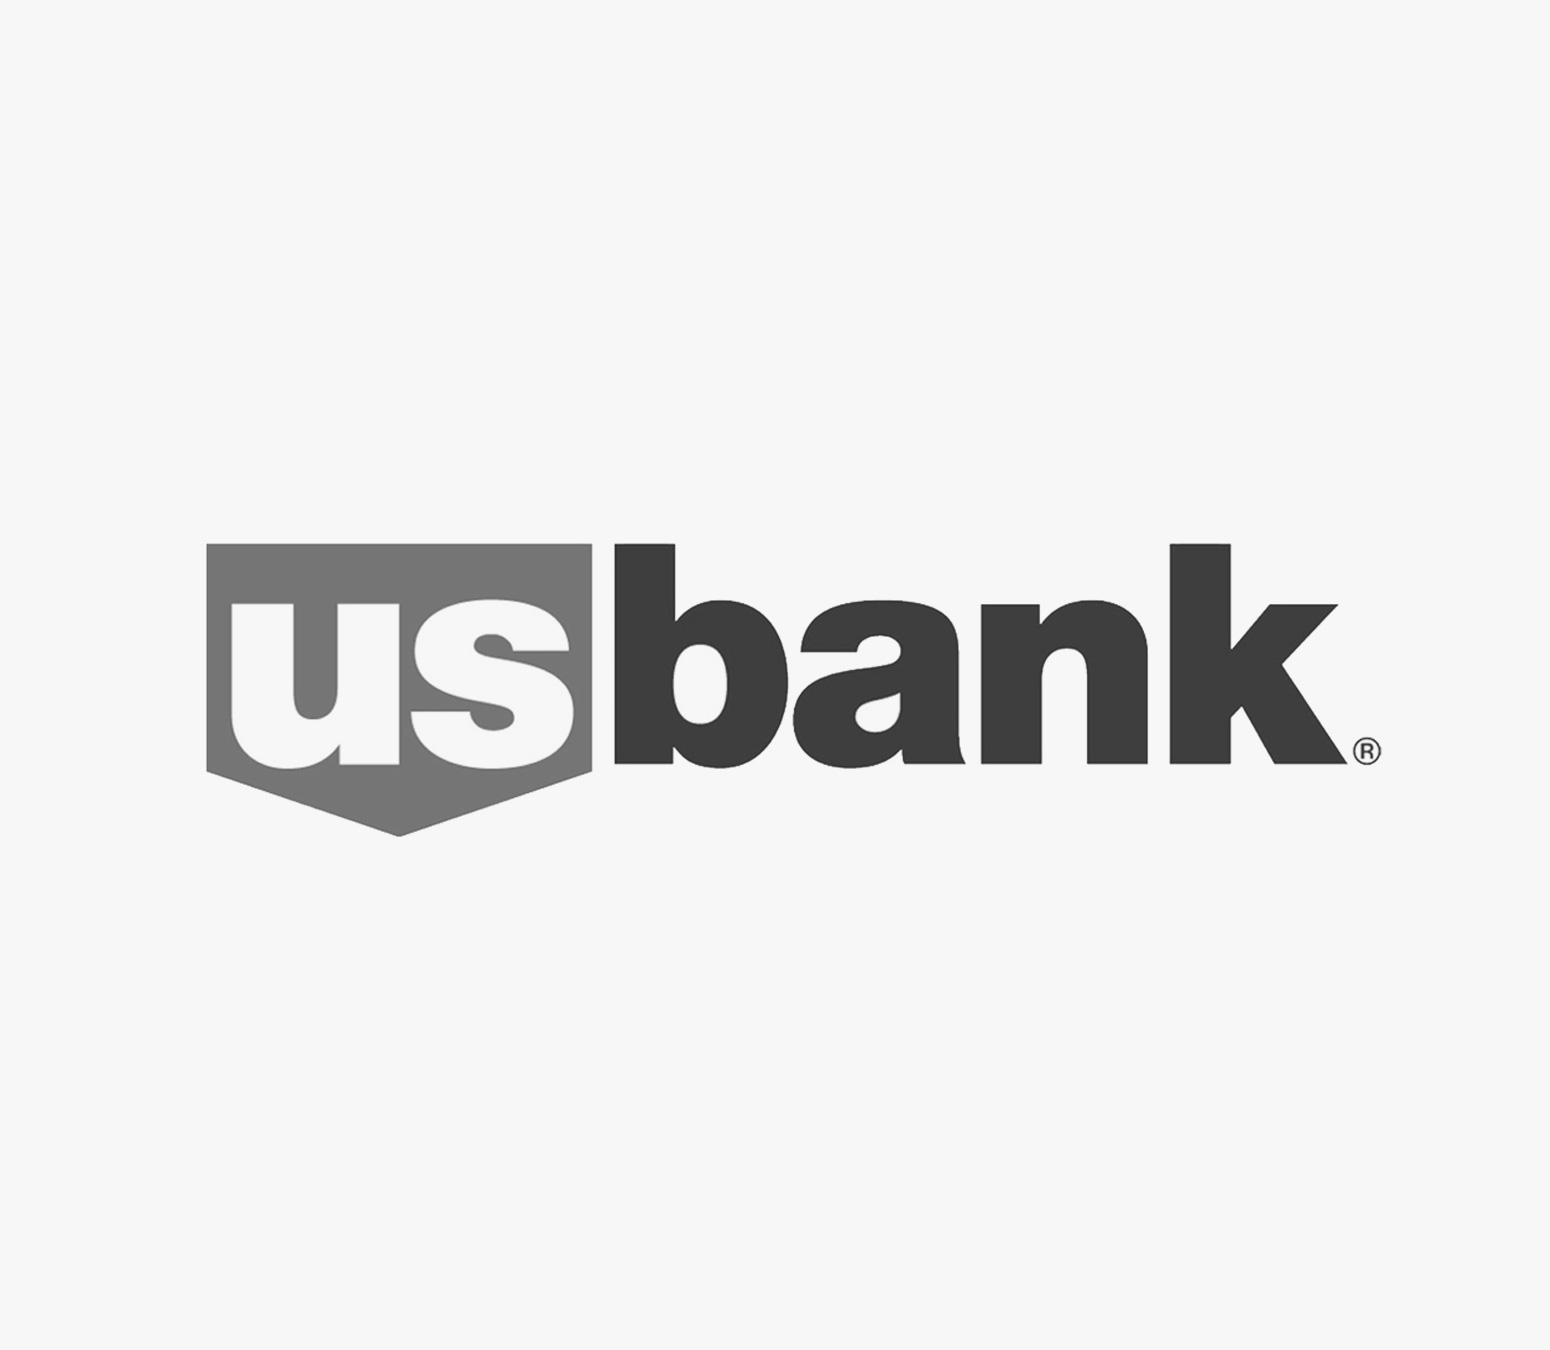 logo-usbank.jpg